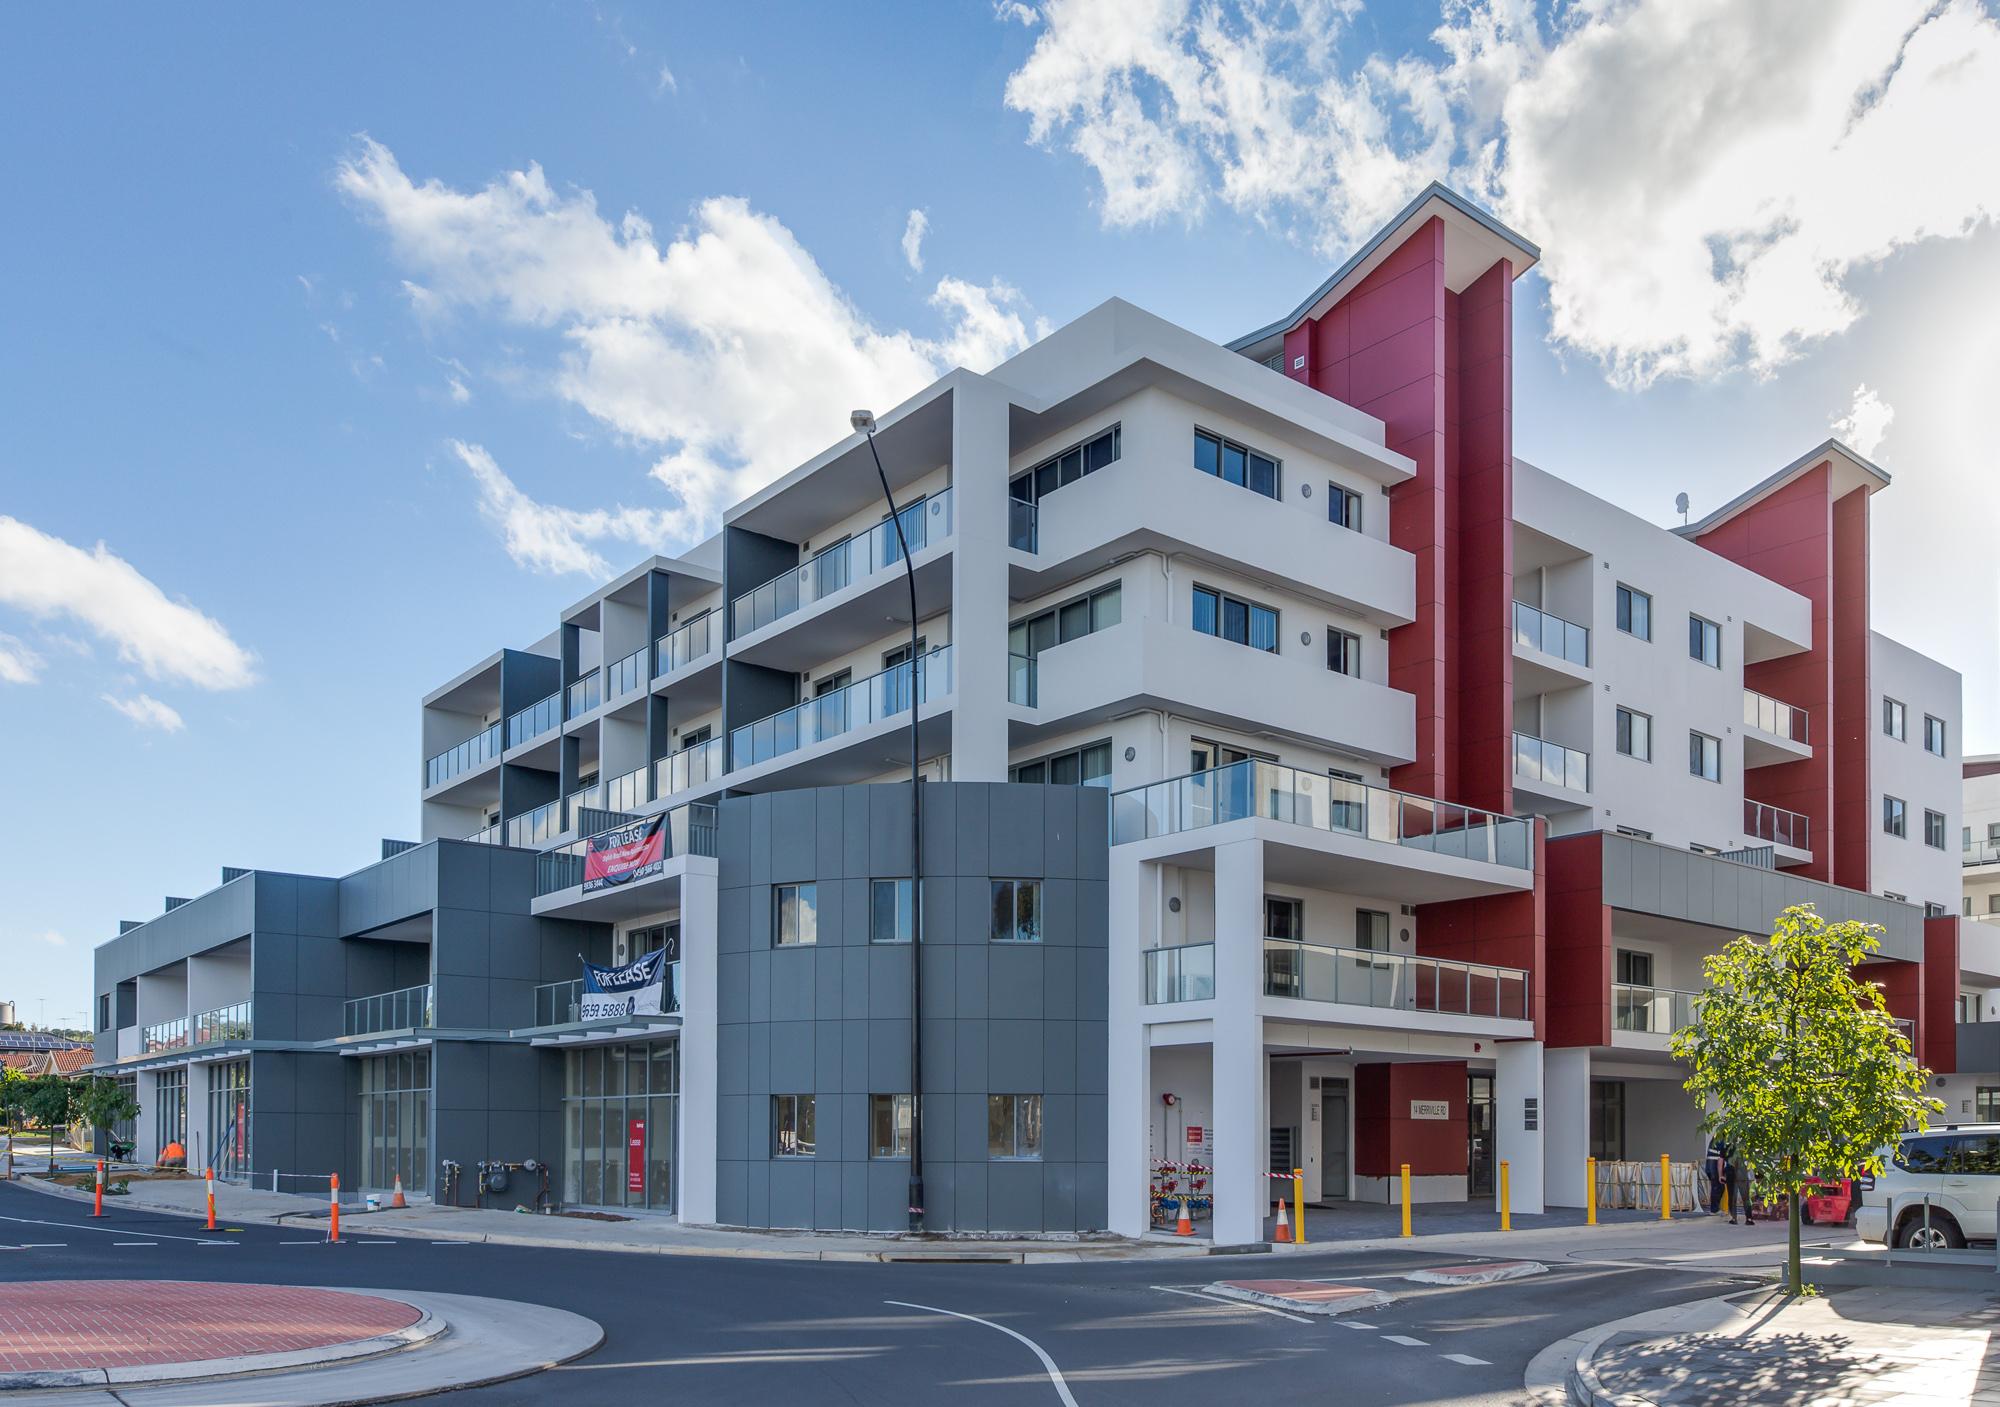 2 Bedrooms, Apartment, For Rent, Merriville Road, 2 Bathrooms, Listing ID 1475, Kellyville Ridge , NSW, Australia, 2155,